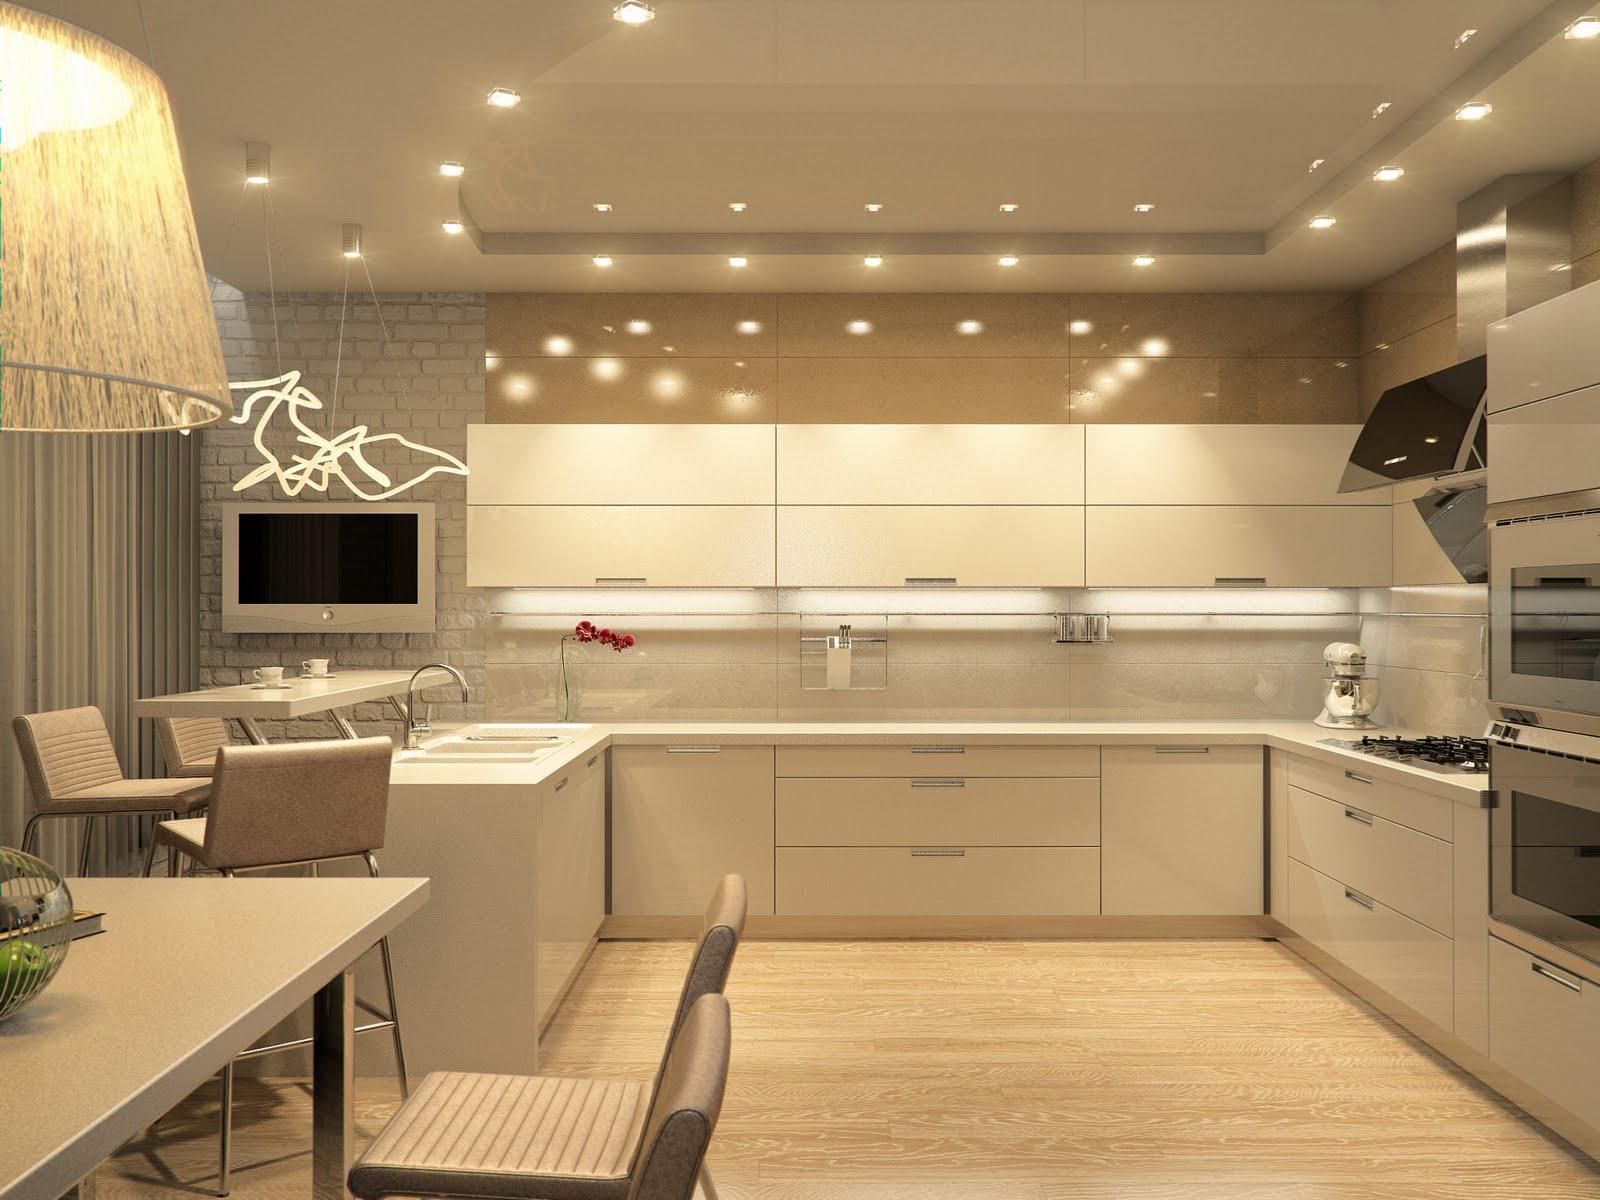 Бежевая кухня в стиле хай-тек